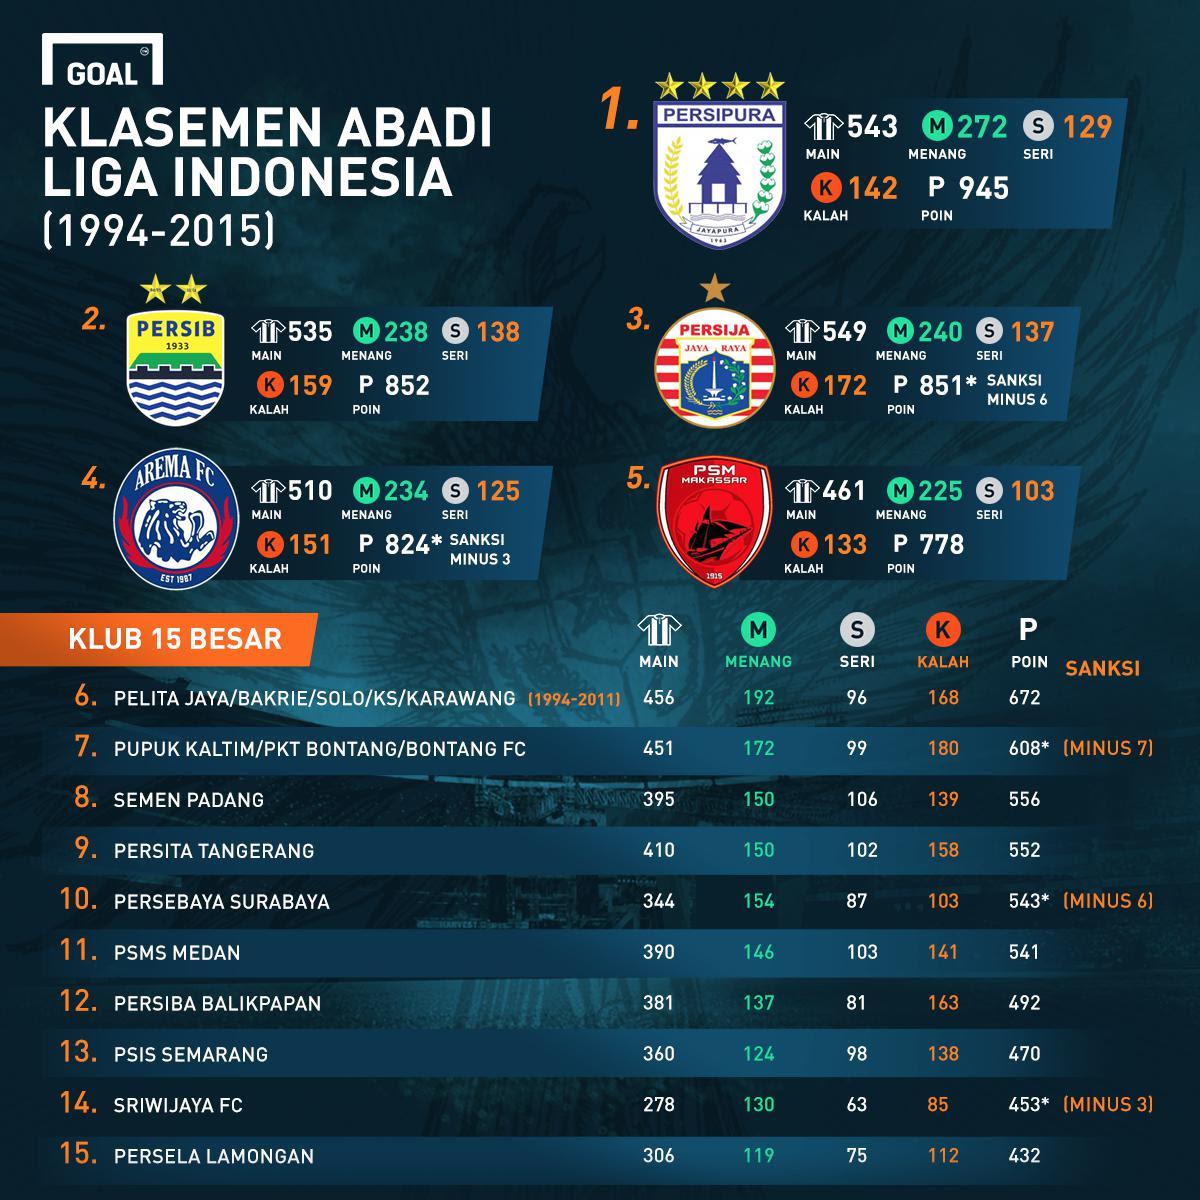 GoalPedia: Klasemen Abadi Liga Indonesia | Goal.com